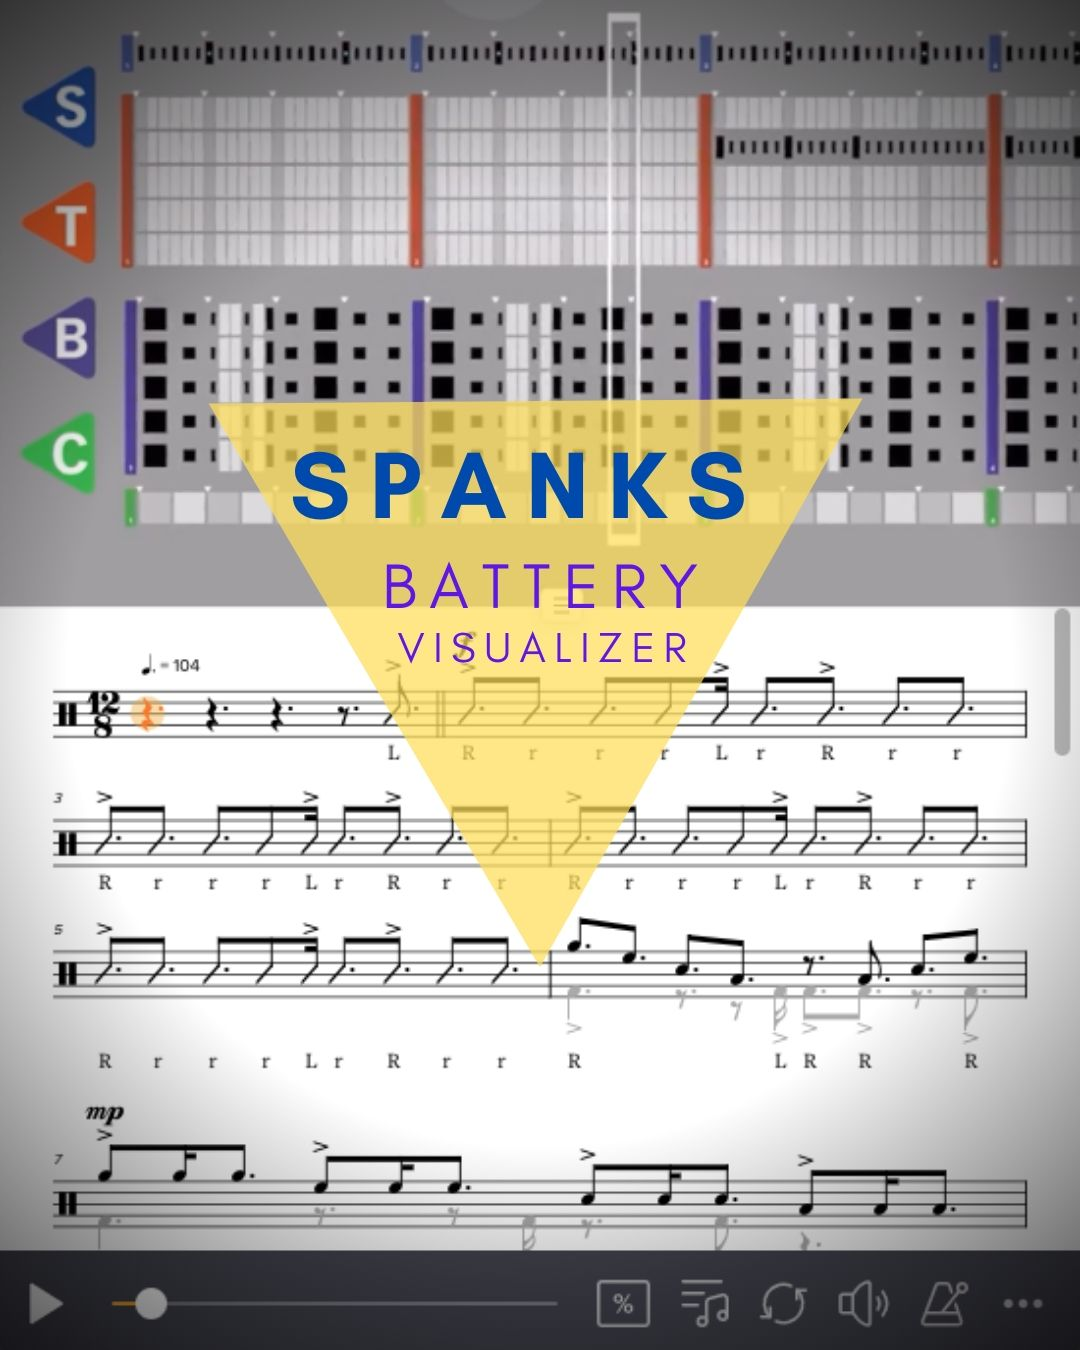 Spanks Bass Visualizer